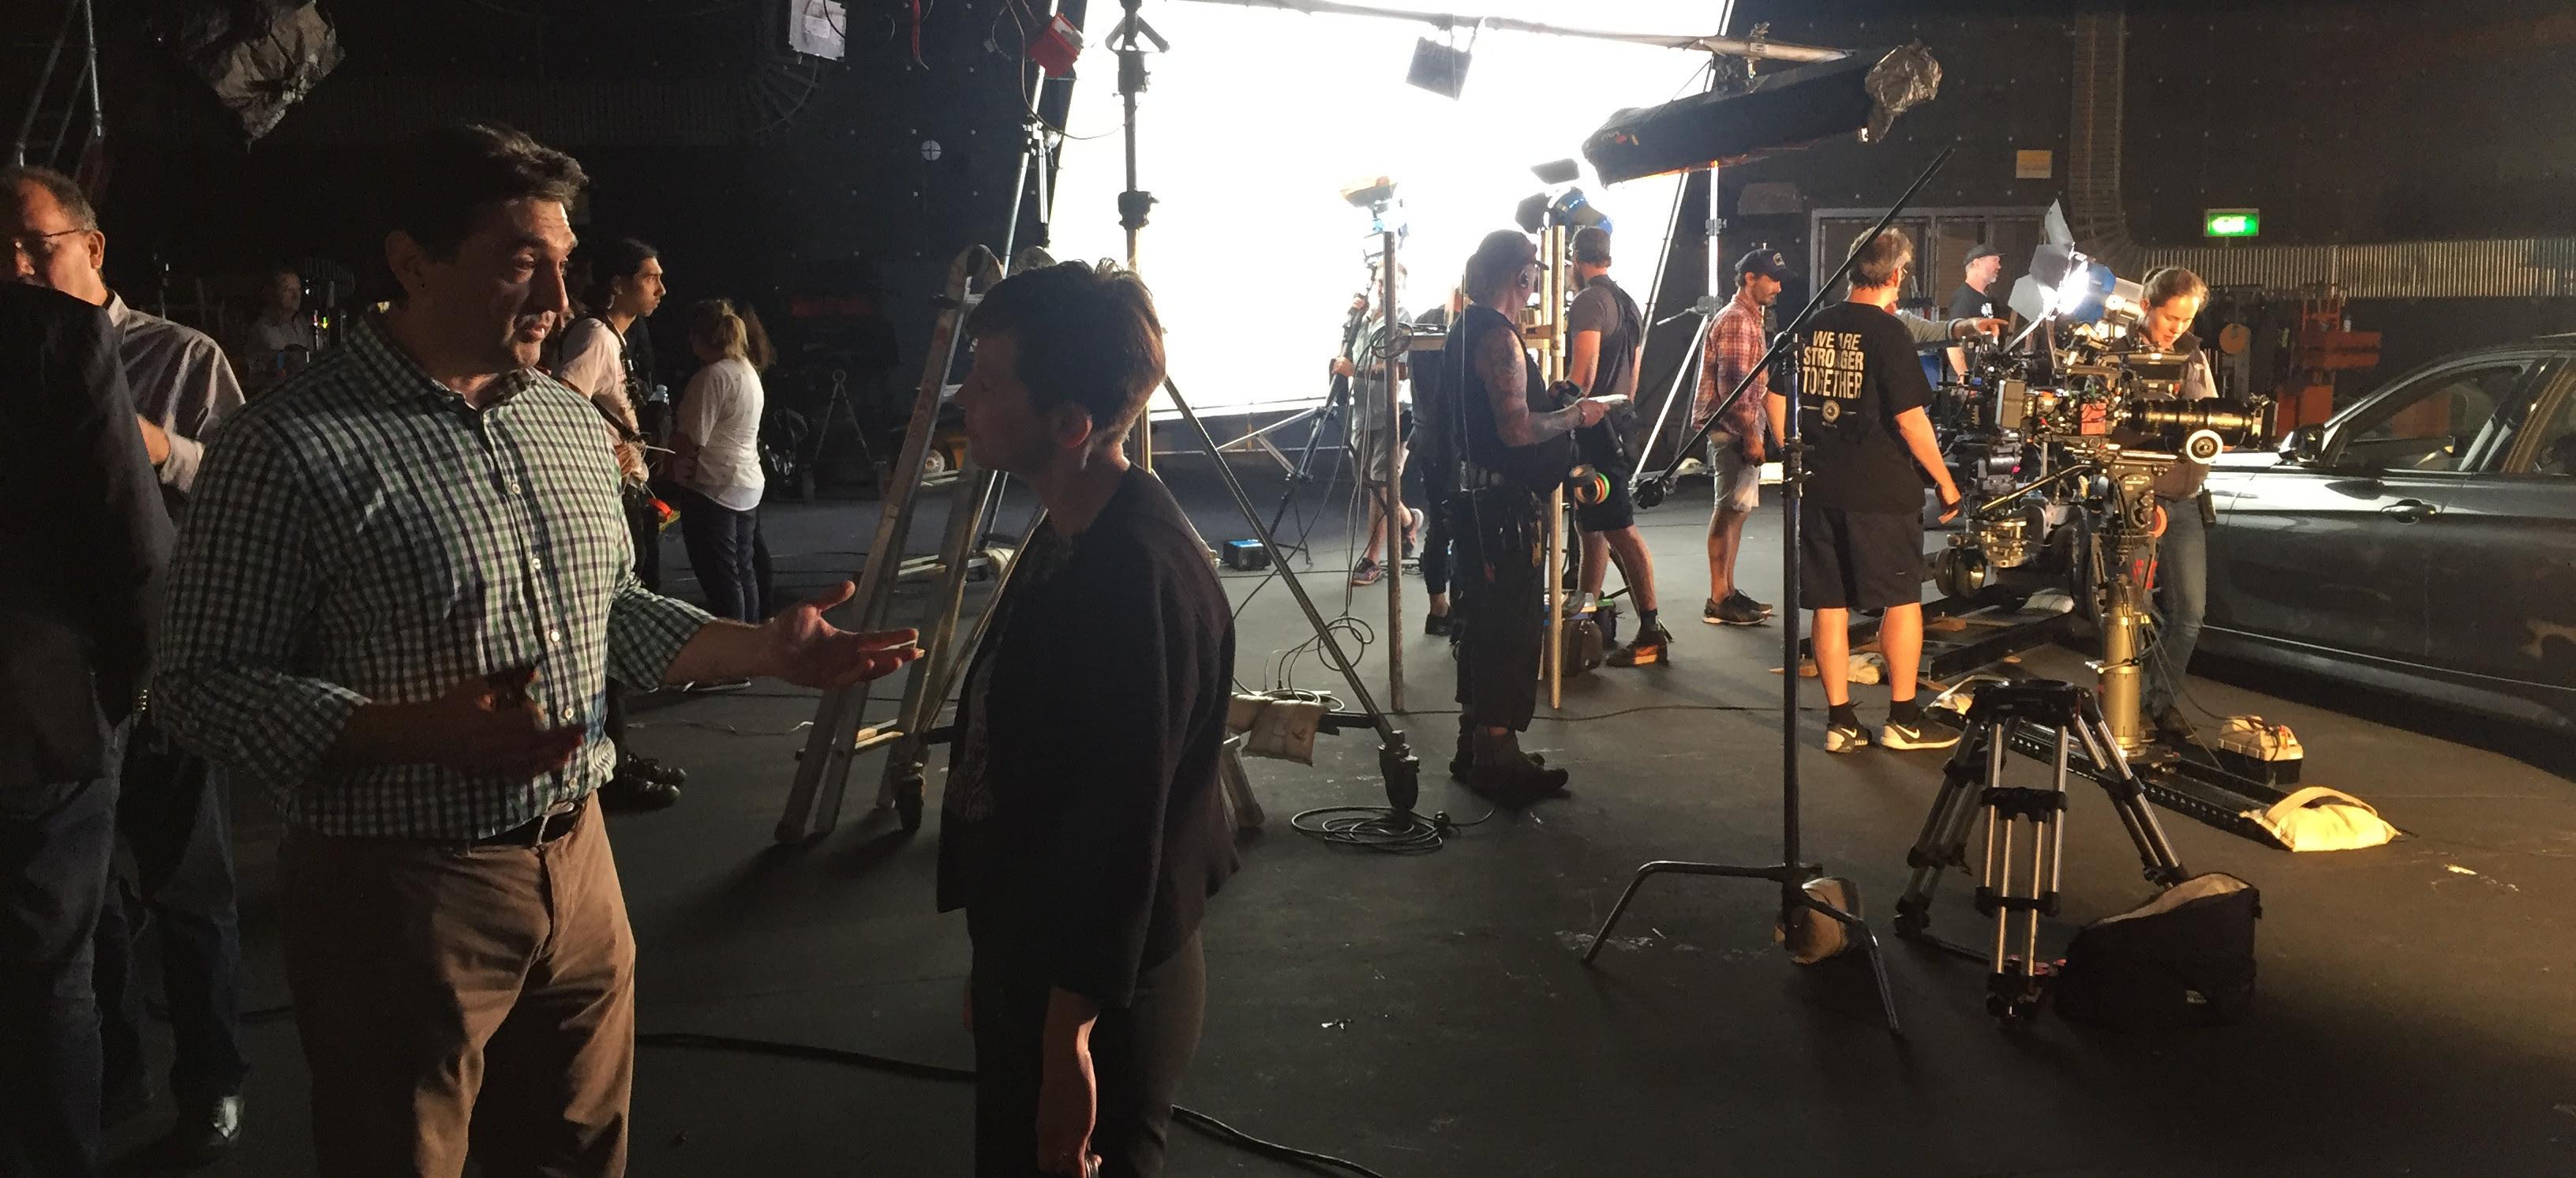 170505_Fox_Studios_Employye_and_Jenny_Tour_of_Fox_Studios_Fox_Studios__Sydney.jpg